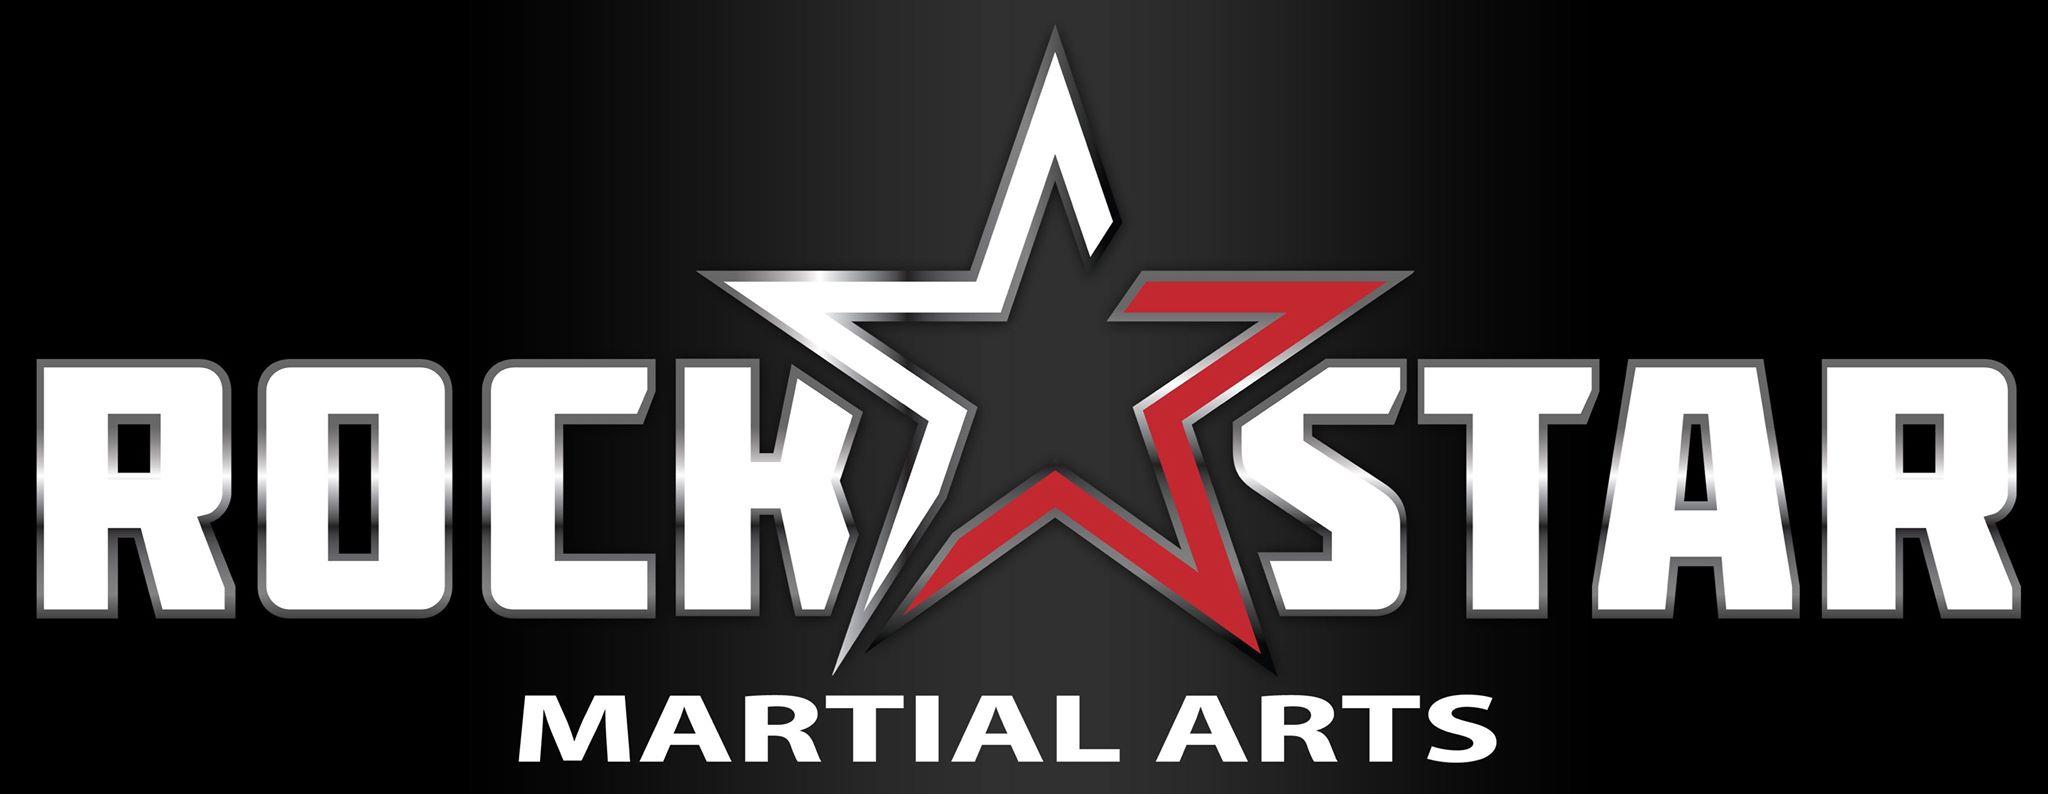 Rockstar martial arts self defense